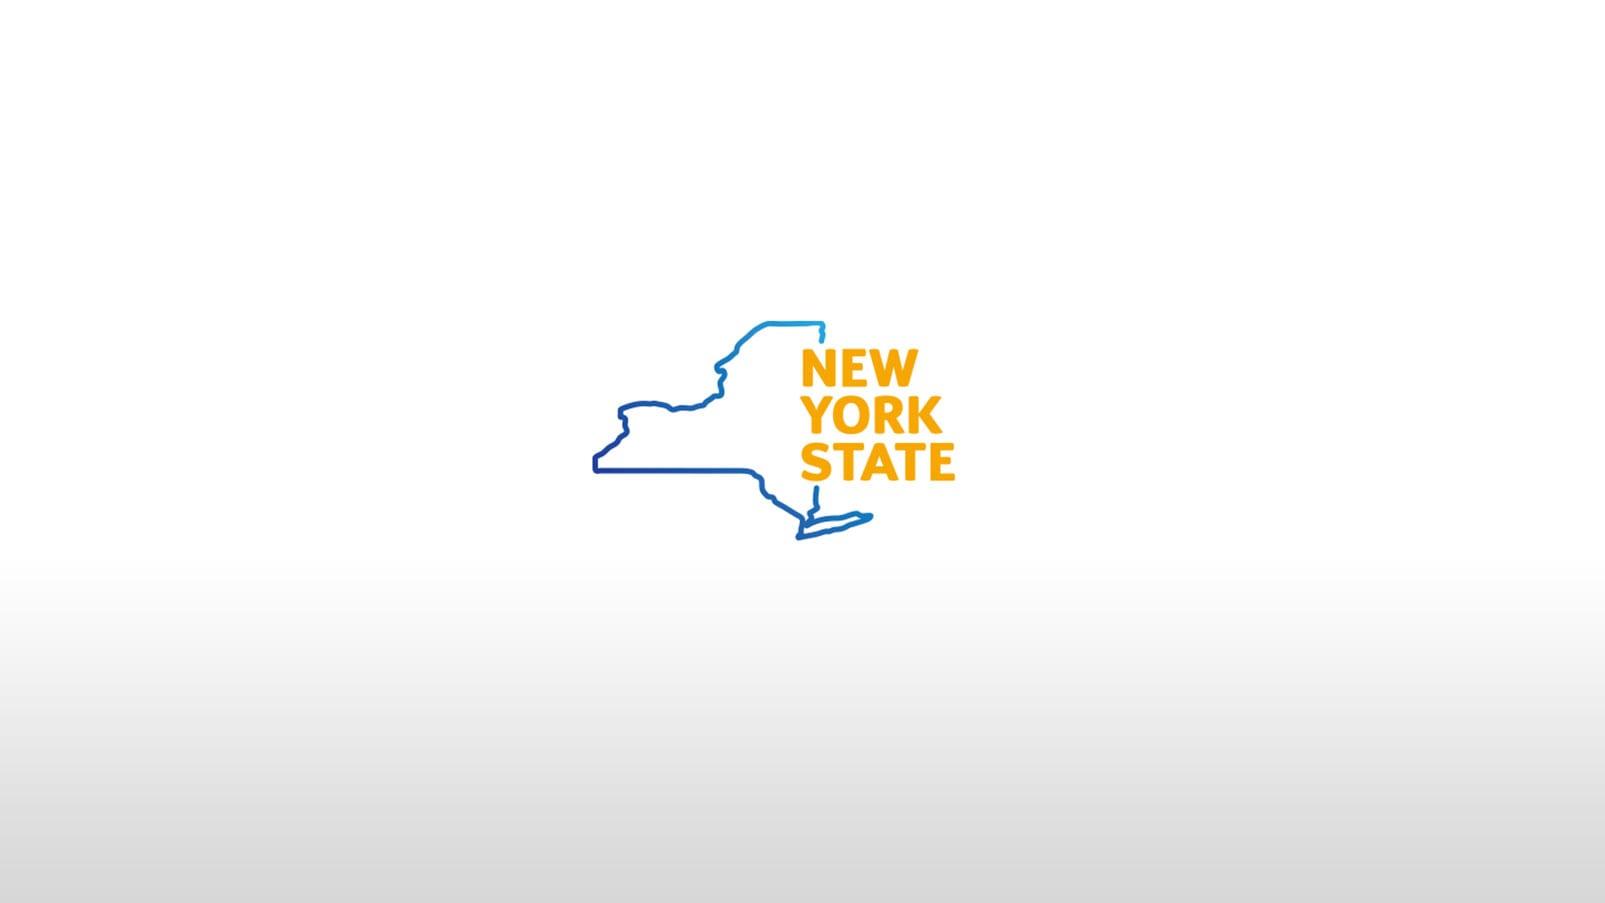 NYS News Site